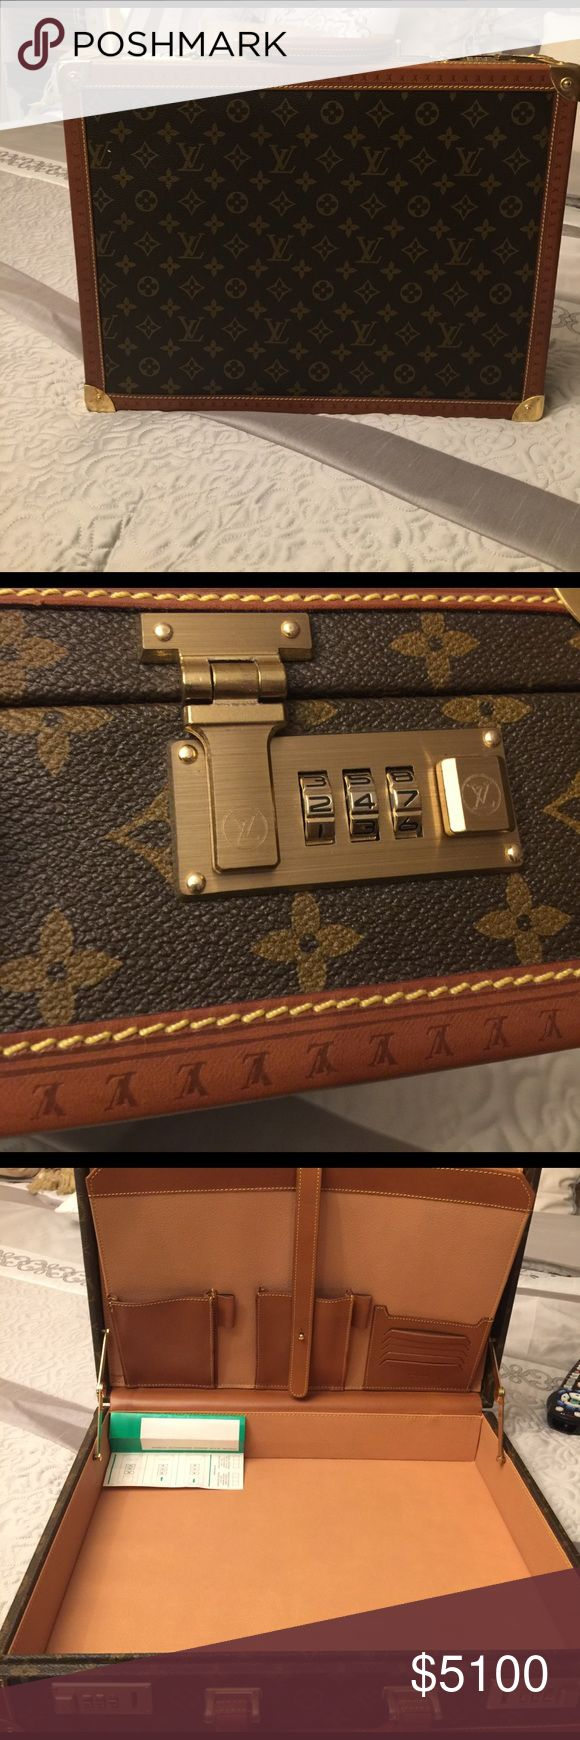 LOUIS VUITTON LV Vintage Monogram PRESIDENT LOUIS VUITTON LV Vintage Monogram PRESIDENT Hard Trunk Briefcase Attaché Case New Real Real Louis Vuitton Other